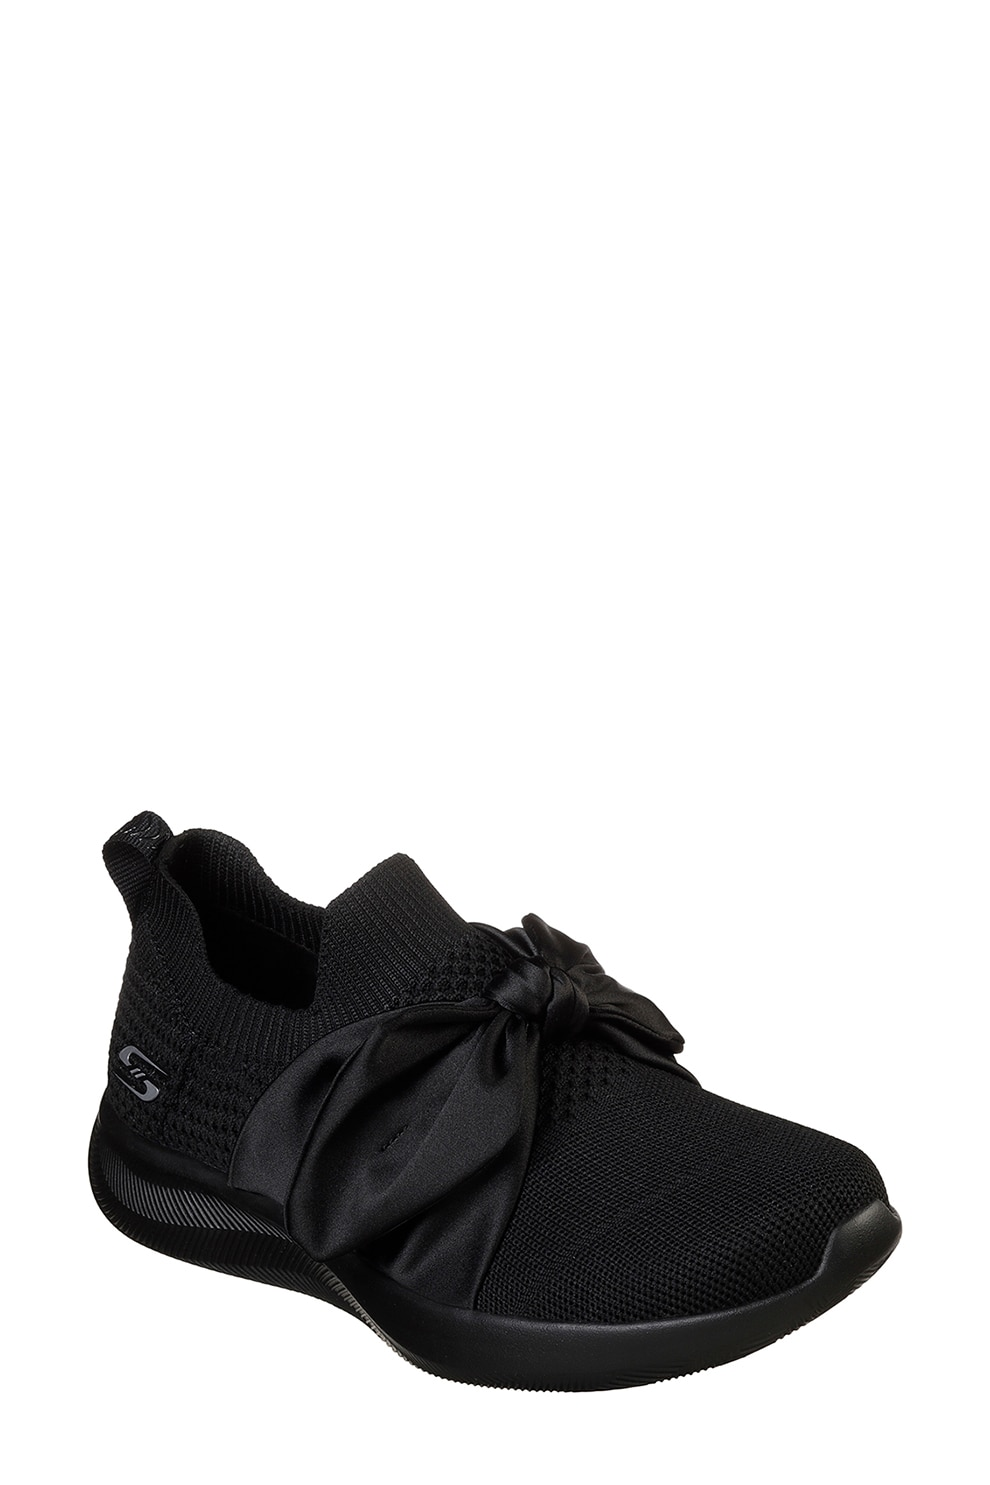 Skechers, Bobs Squad 2 Bow Beauty Bebújós sneaker masnival, Fekete, 37